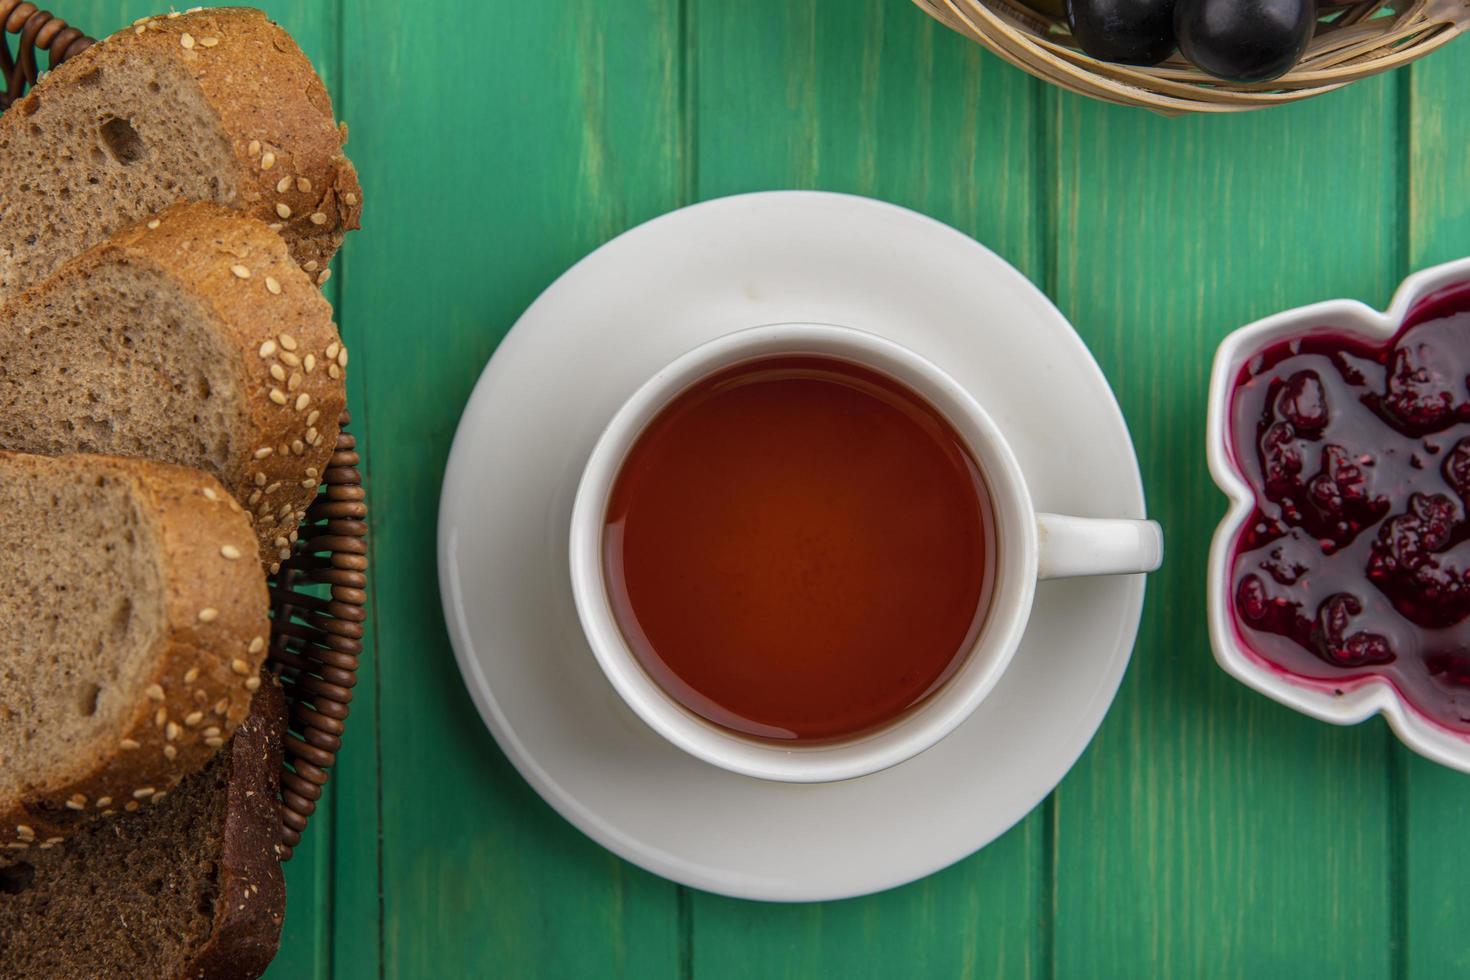 kopje thee met brood en frambozenjam op groene achtergrond foto